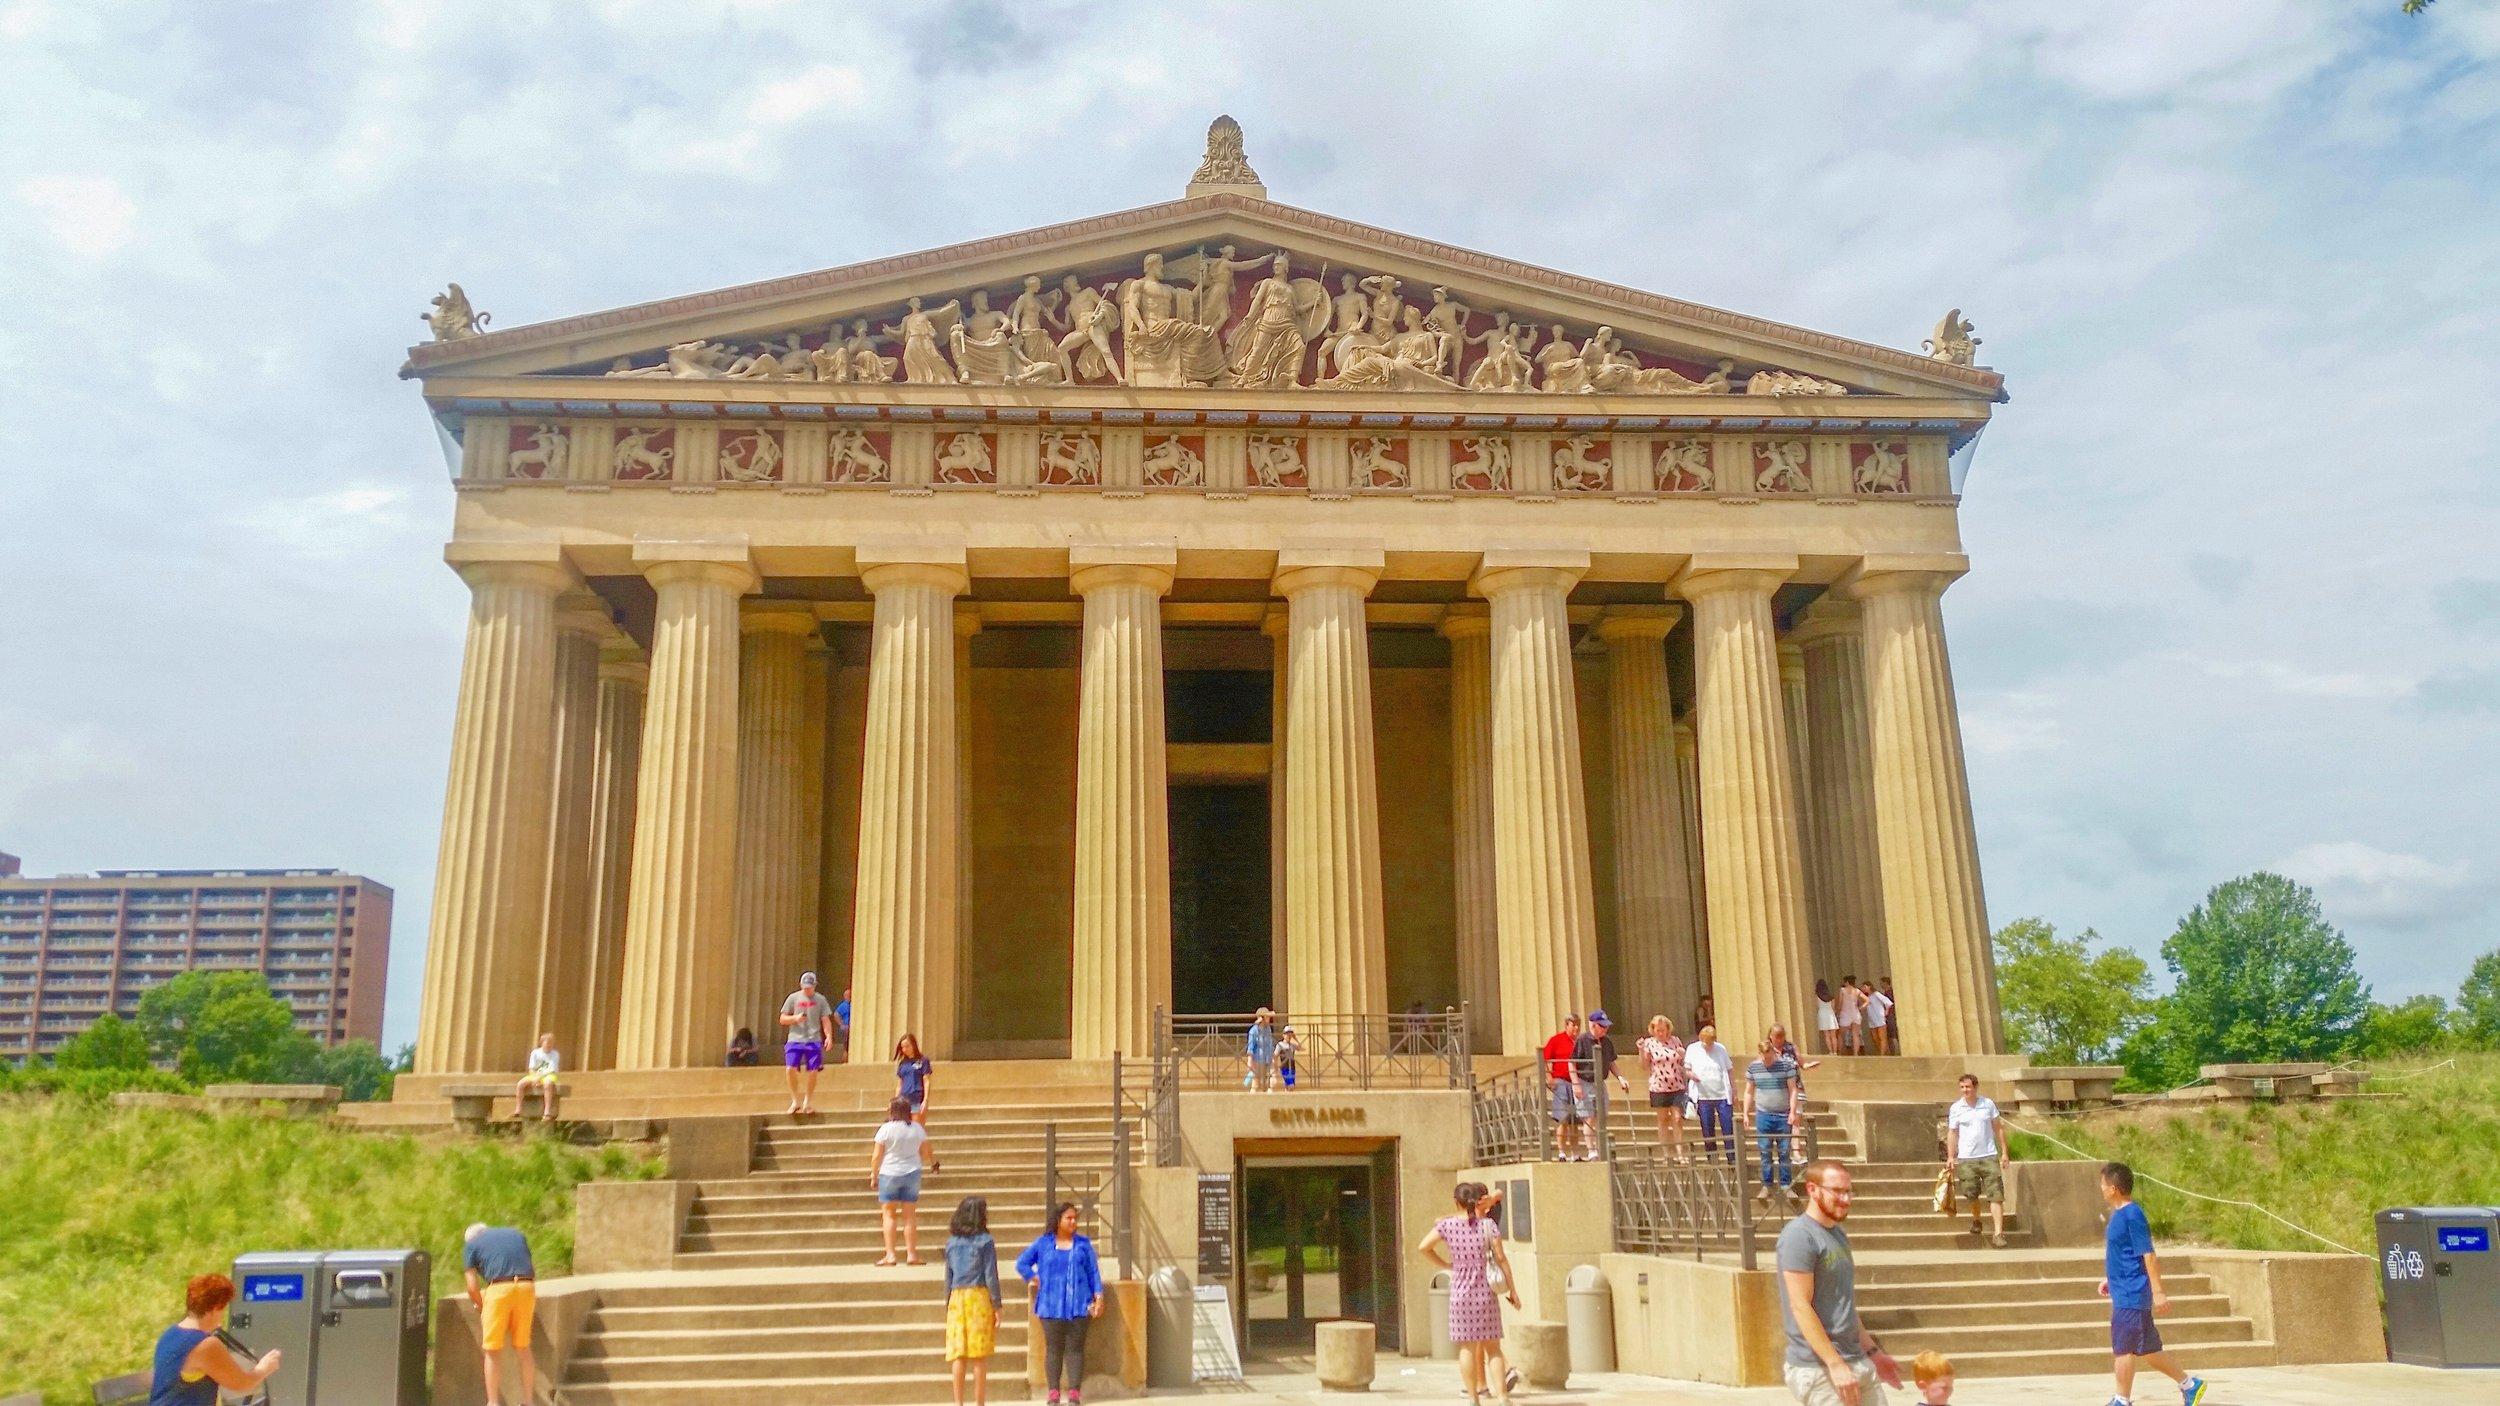 Nashville's Parthenon, a full-scale replica of the Greek masterpiece